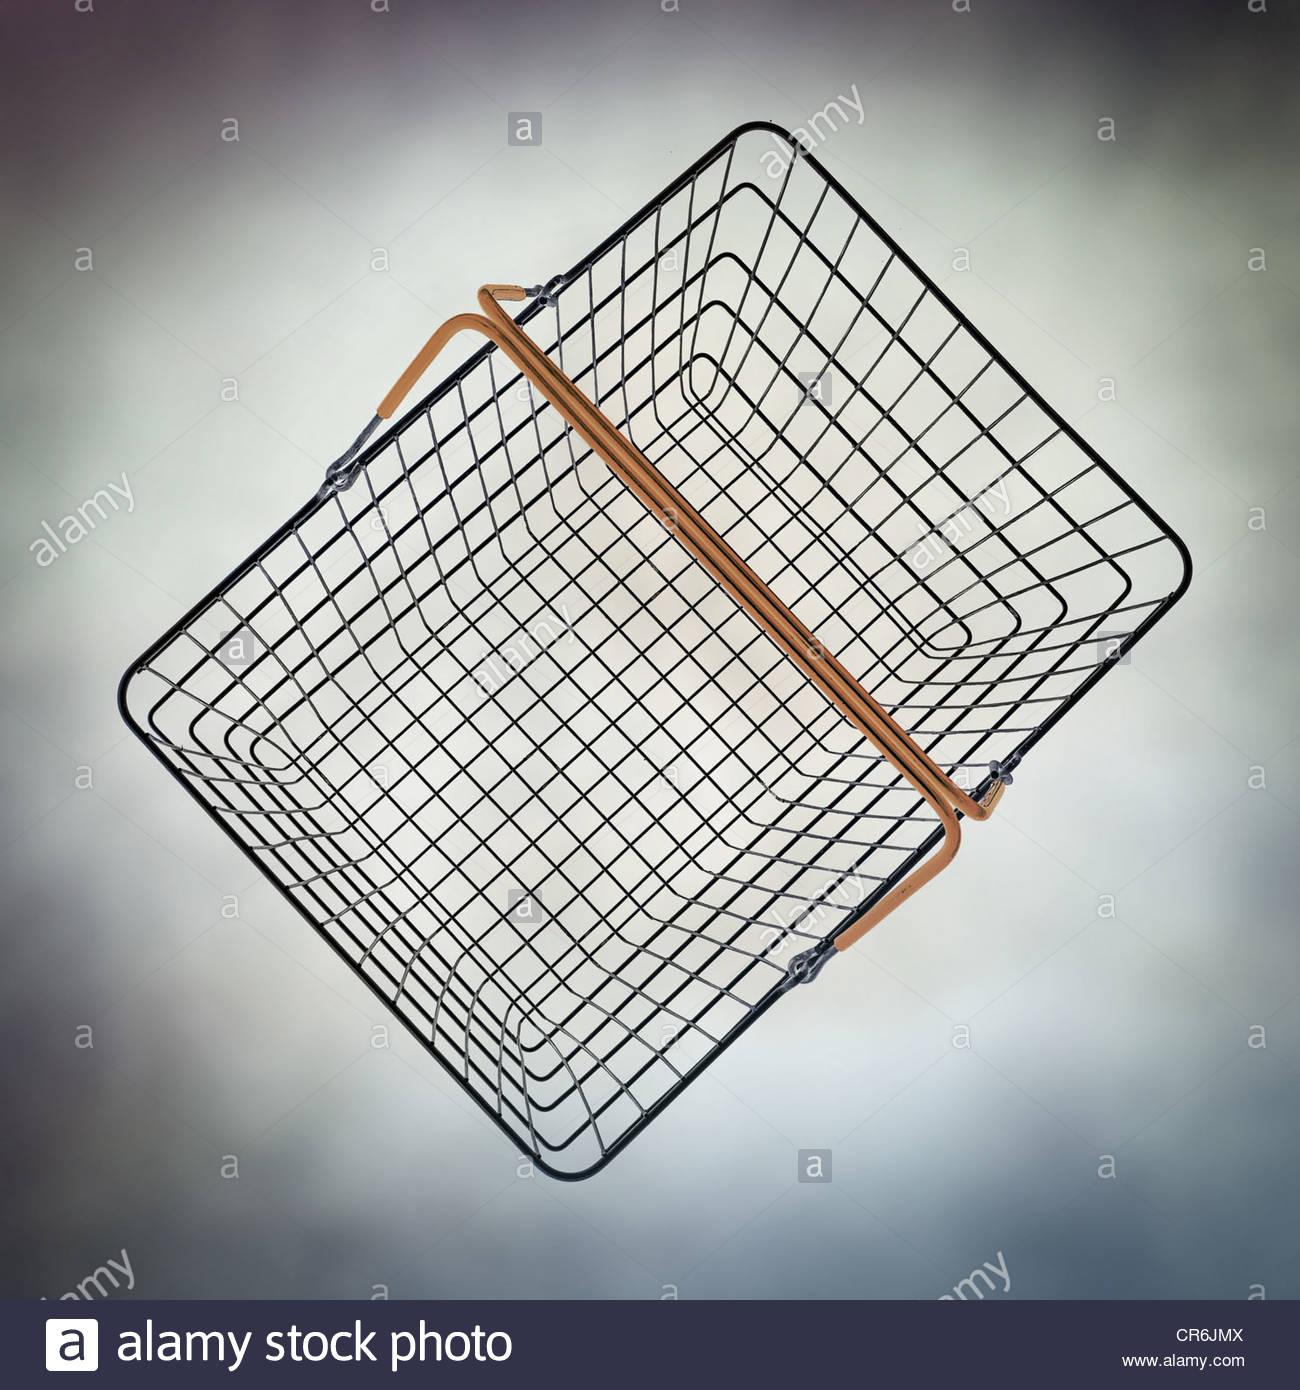 empty wire basket - Stock Image